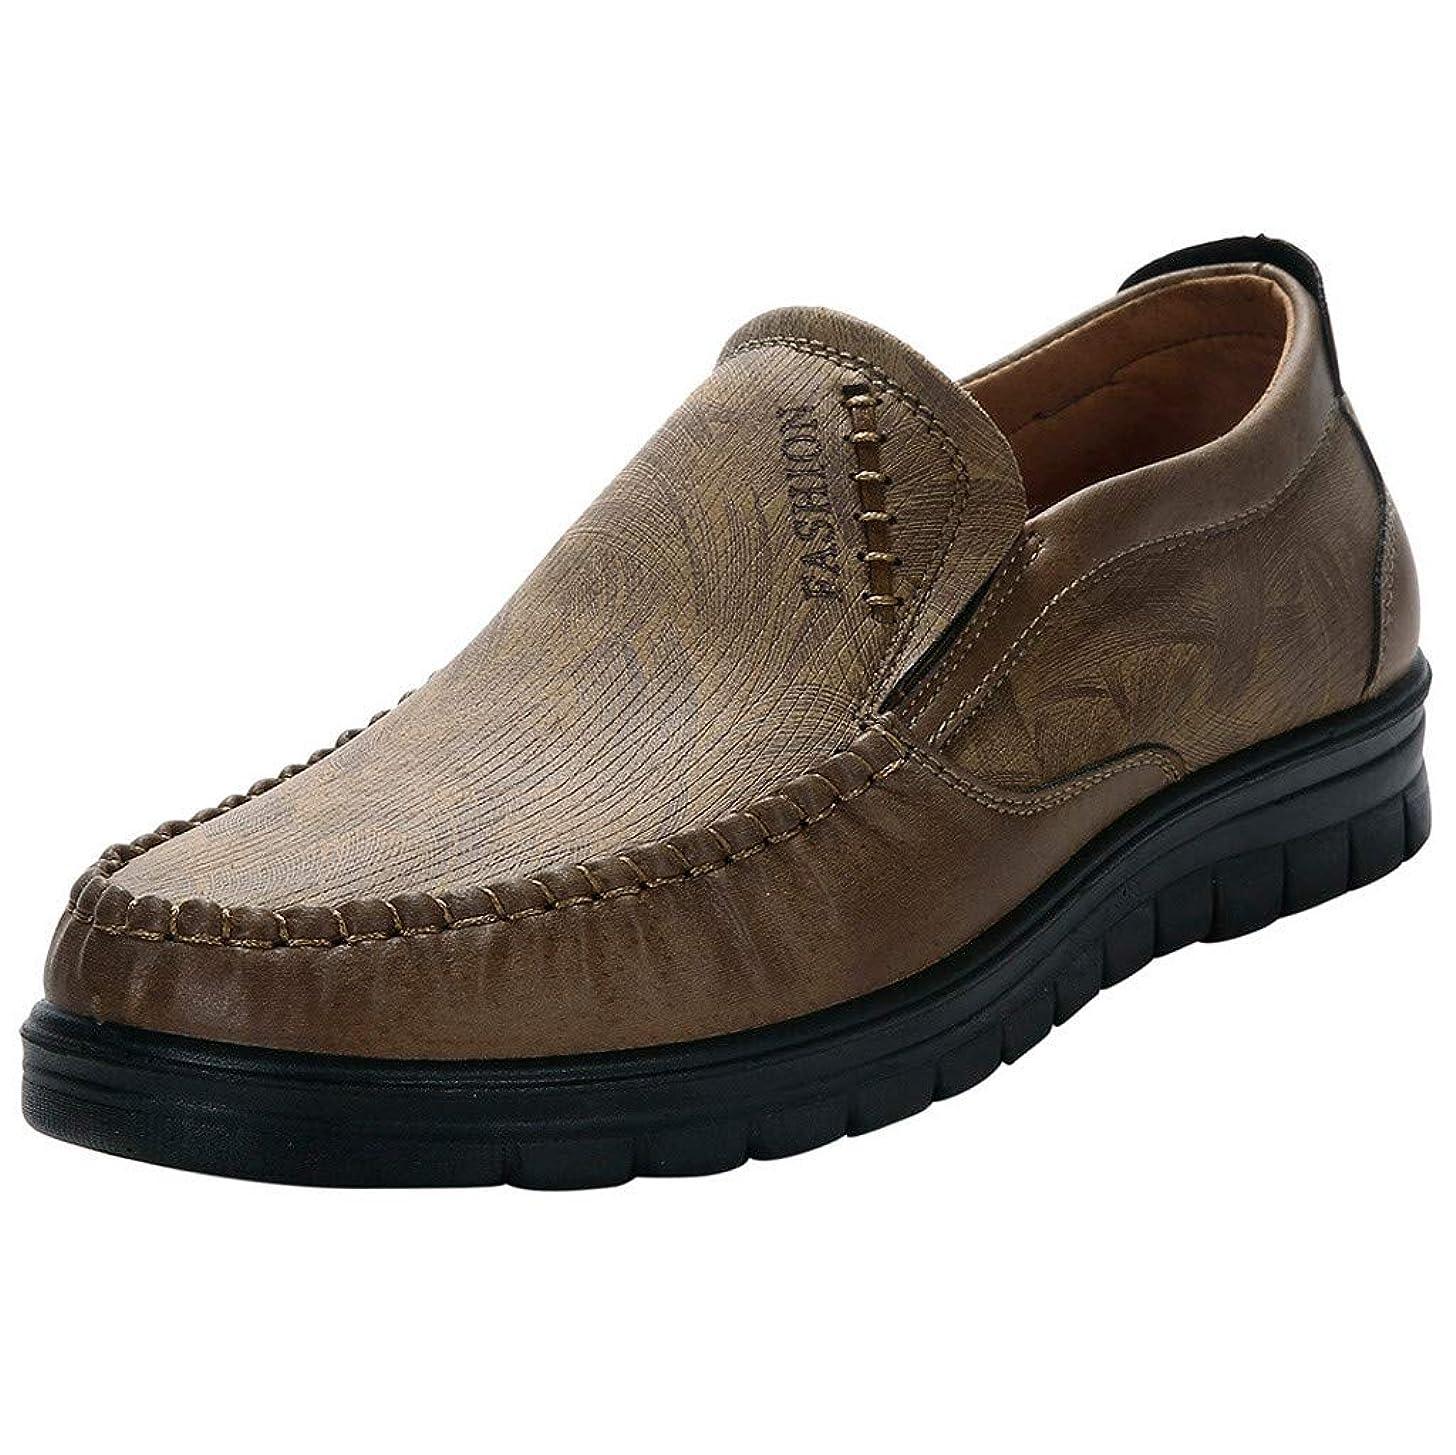 Men Single Shoes, Summer Clearance Non-slip Wear Shoes Leisure Solid Color Flat Shoes Round Toe Business Shoes Hot Sale lkoezi